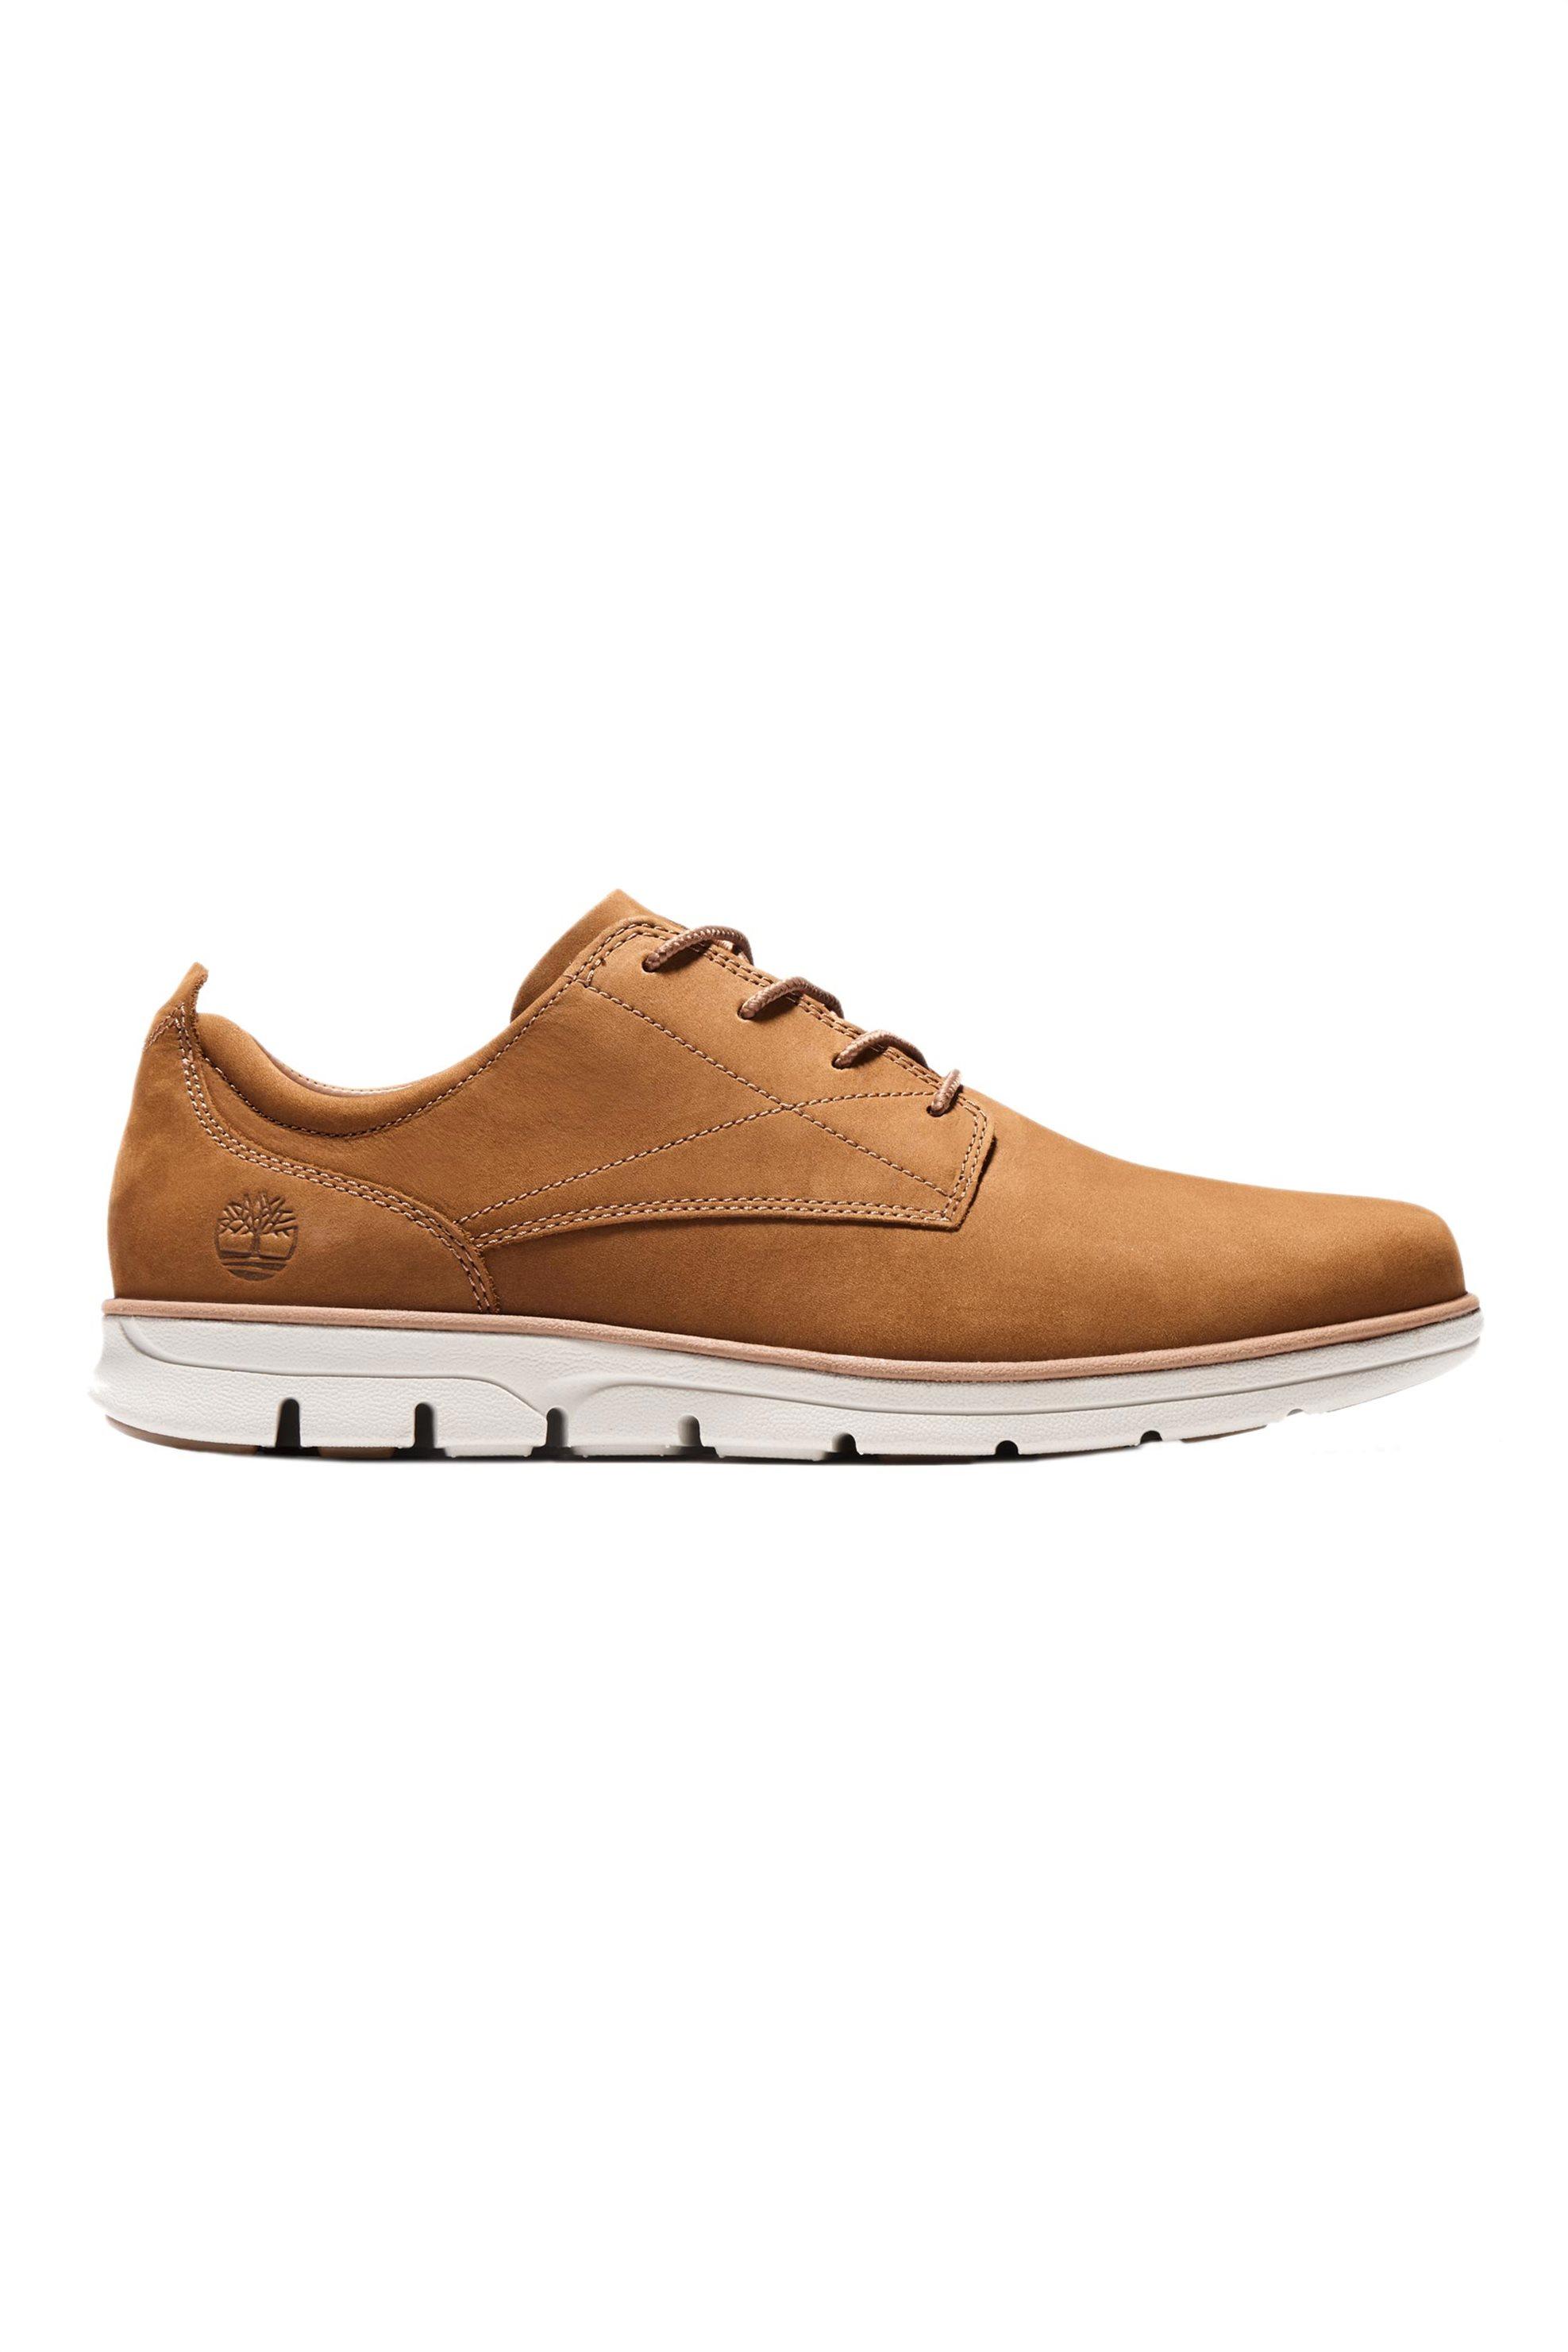 "Timberland ανδρικά παπούτσια ""Bradstreet Plain Toe"" – TB0A2A3EF131 – Ταμπά"